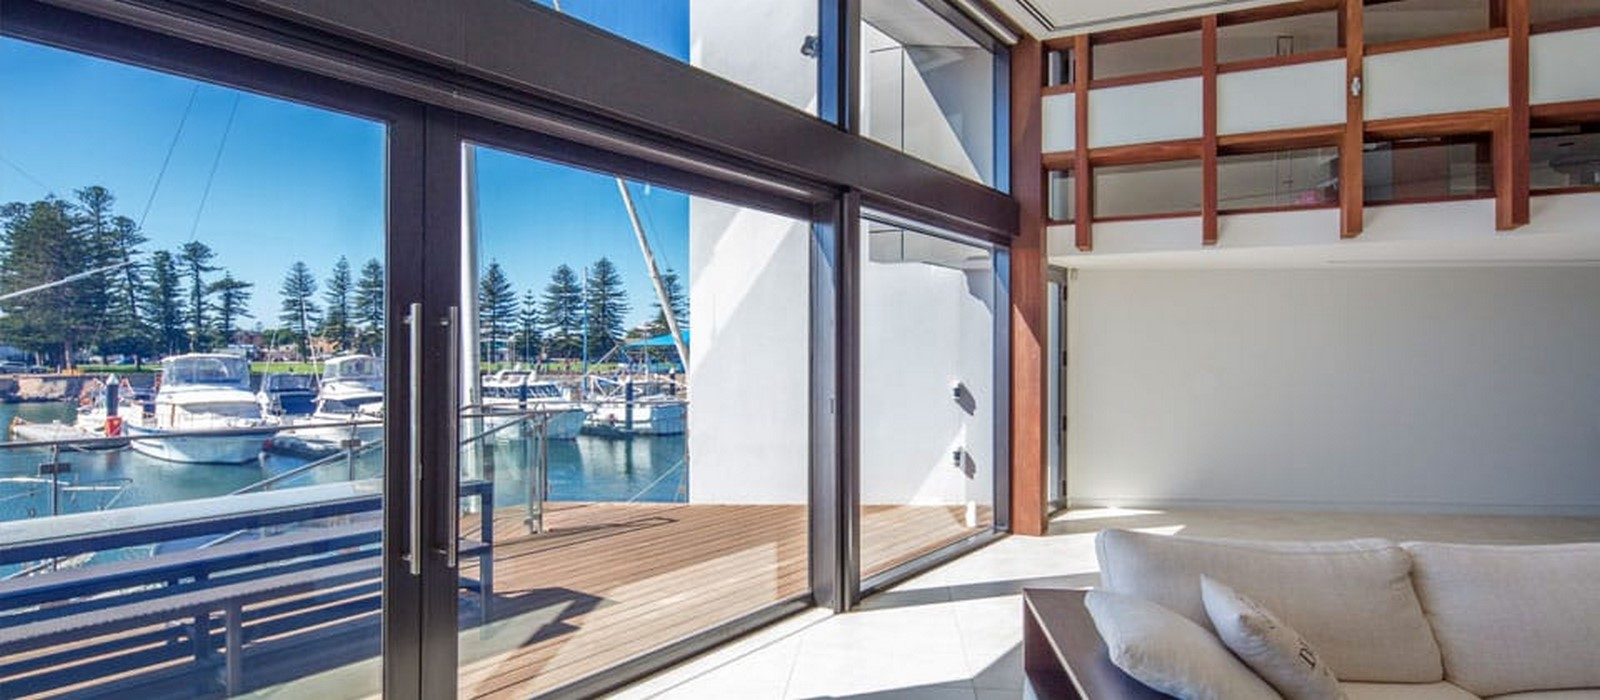 Cygnet Court Residence, Glenelg North, South Australia - Sheet3